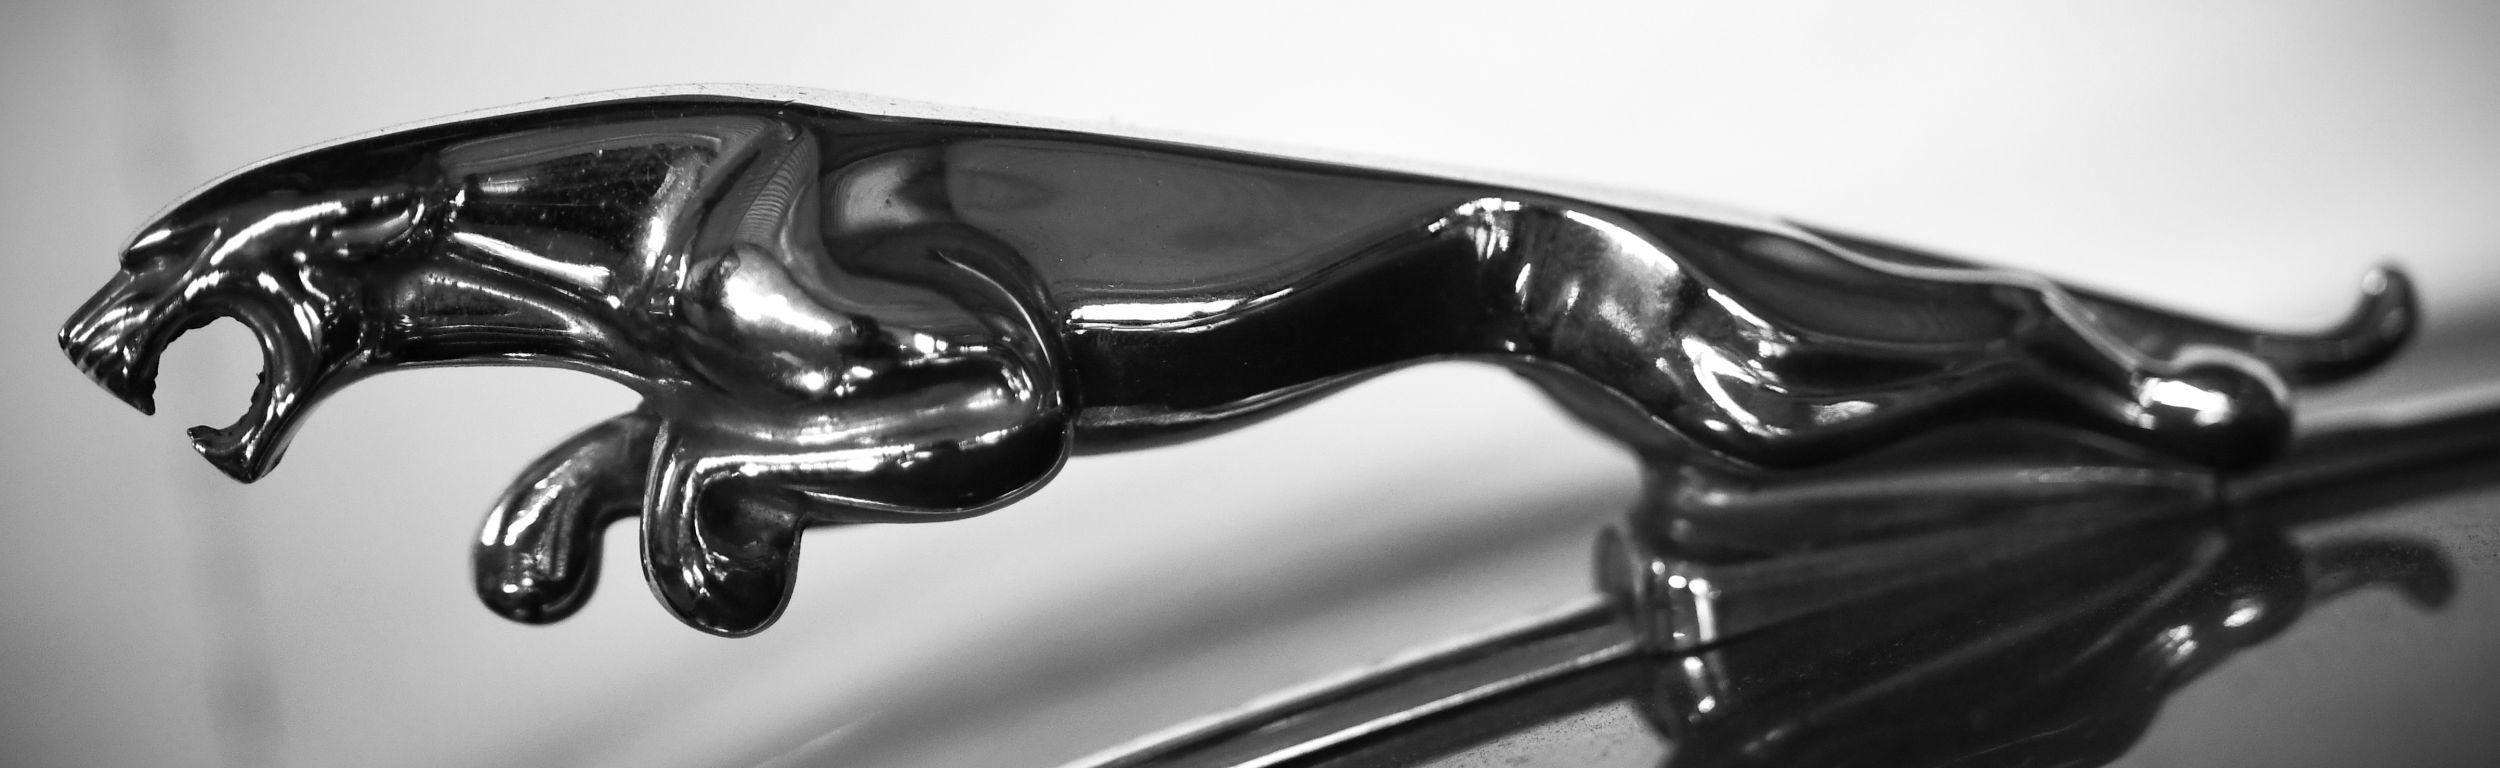 12_Jaguar